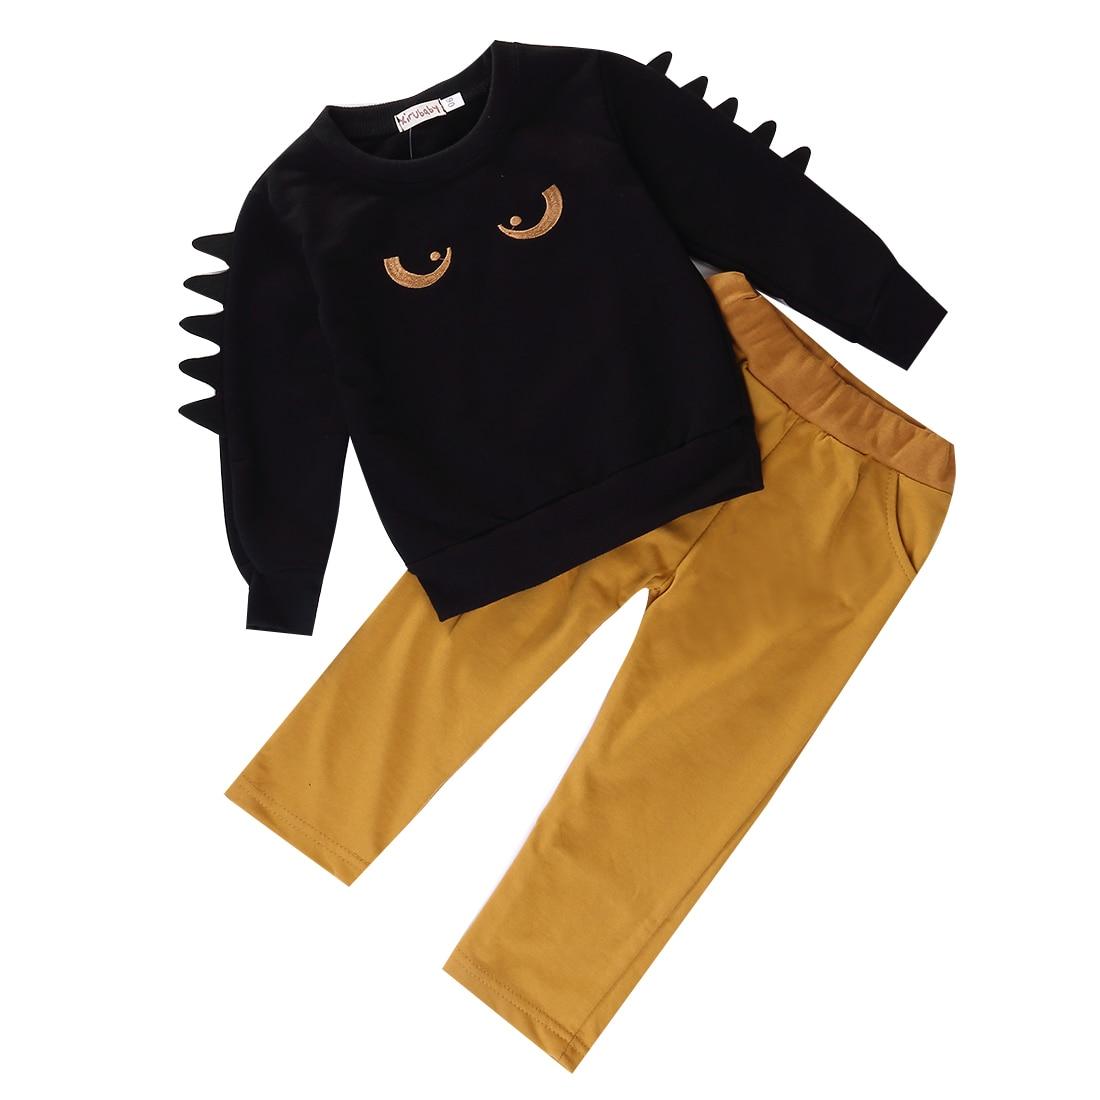 Fashion Cute Special Autumn Baby Boy Casual T-shirt Tops+Long Pants 2pcs Set 1-5Years Cotton